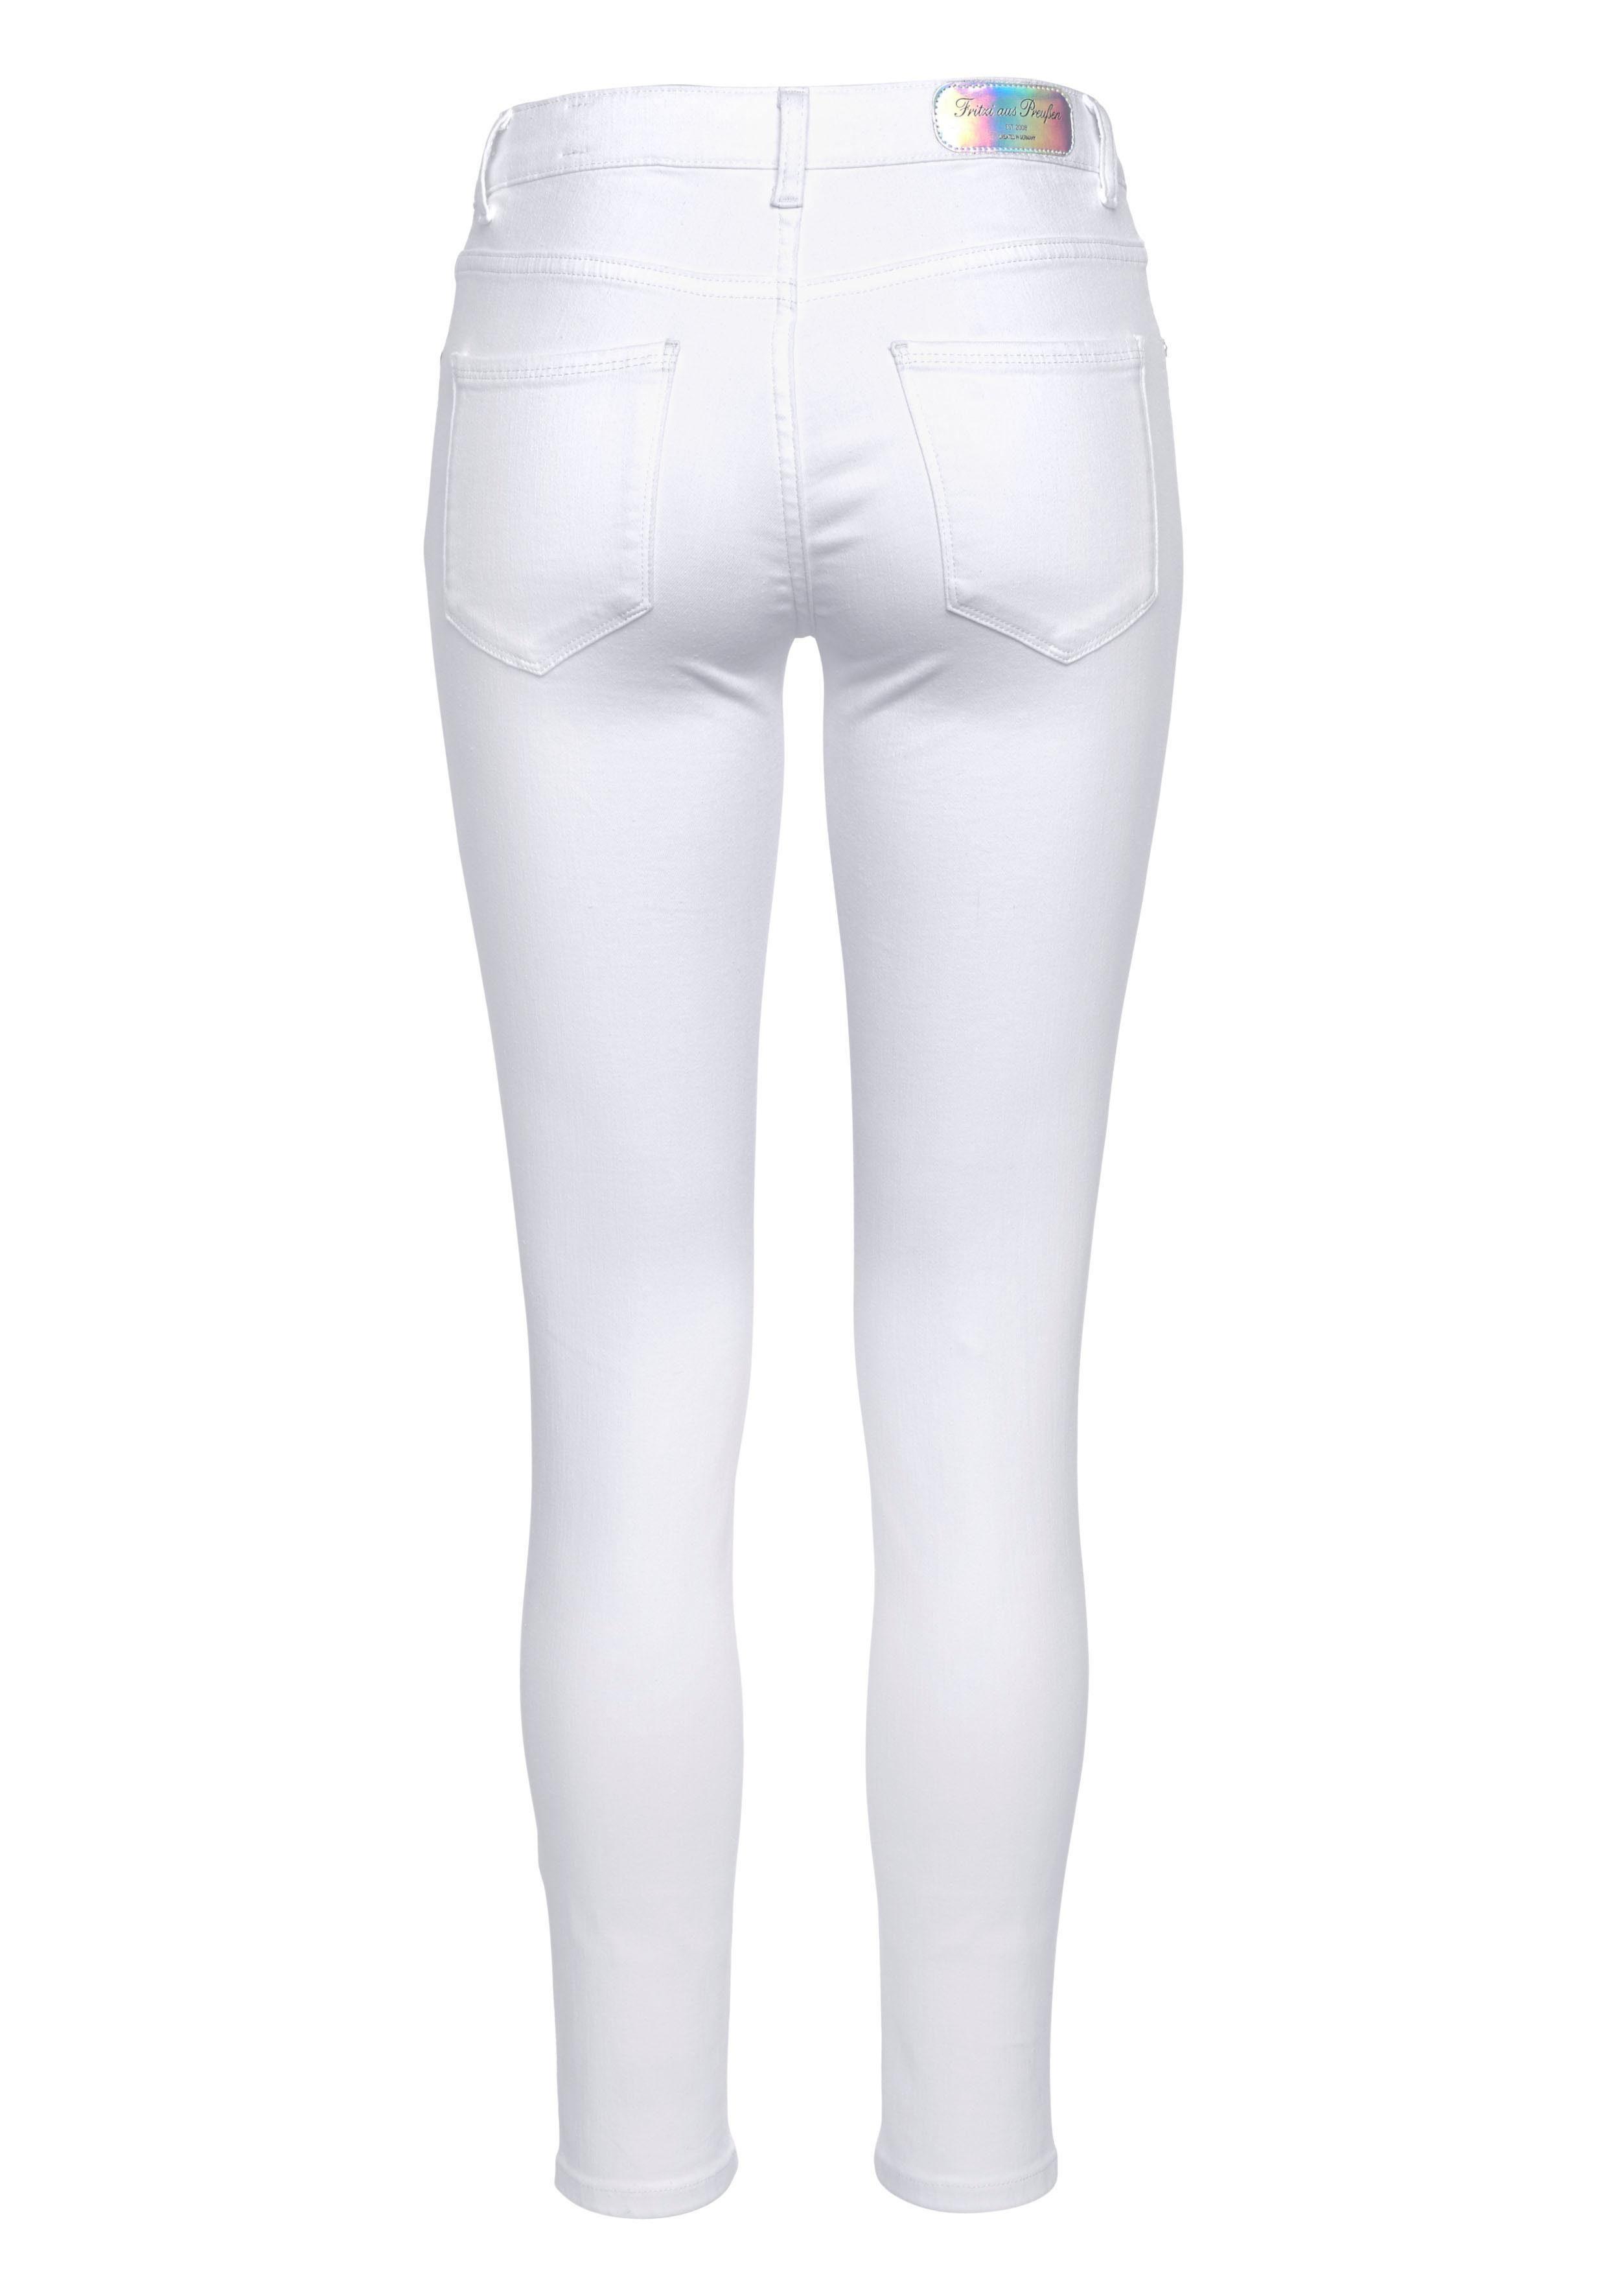 Preußen fit Aus länge Online jeans Kaufen Fritzi Cropped« In »downey Skinny Ankle NXOk8n0wPZ